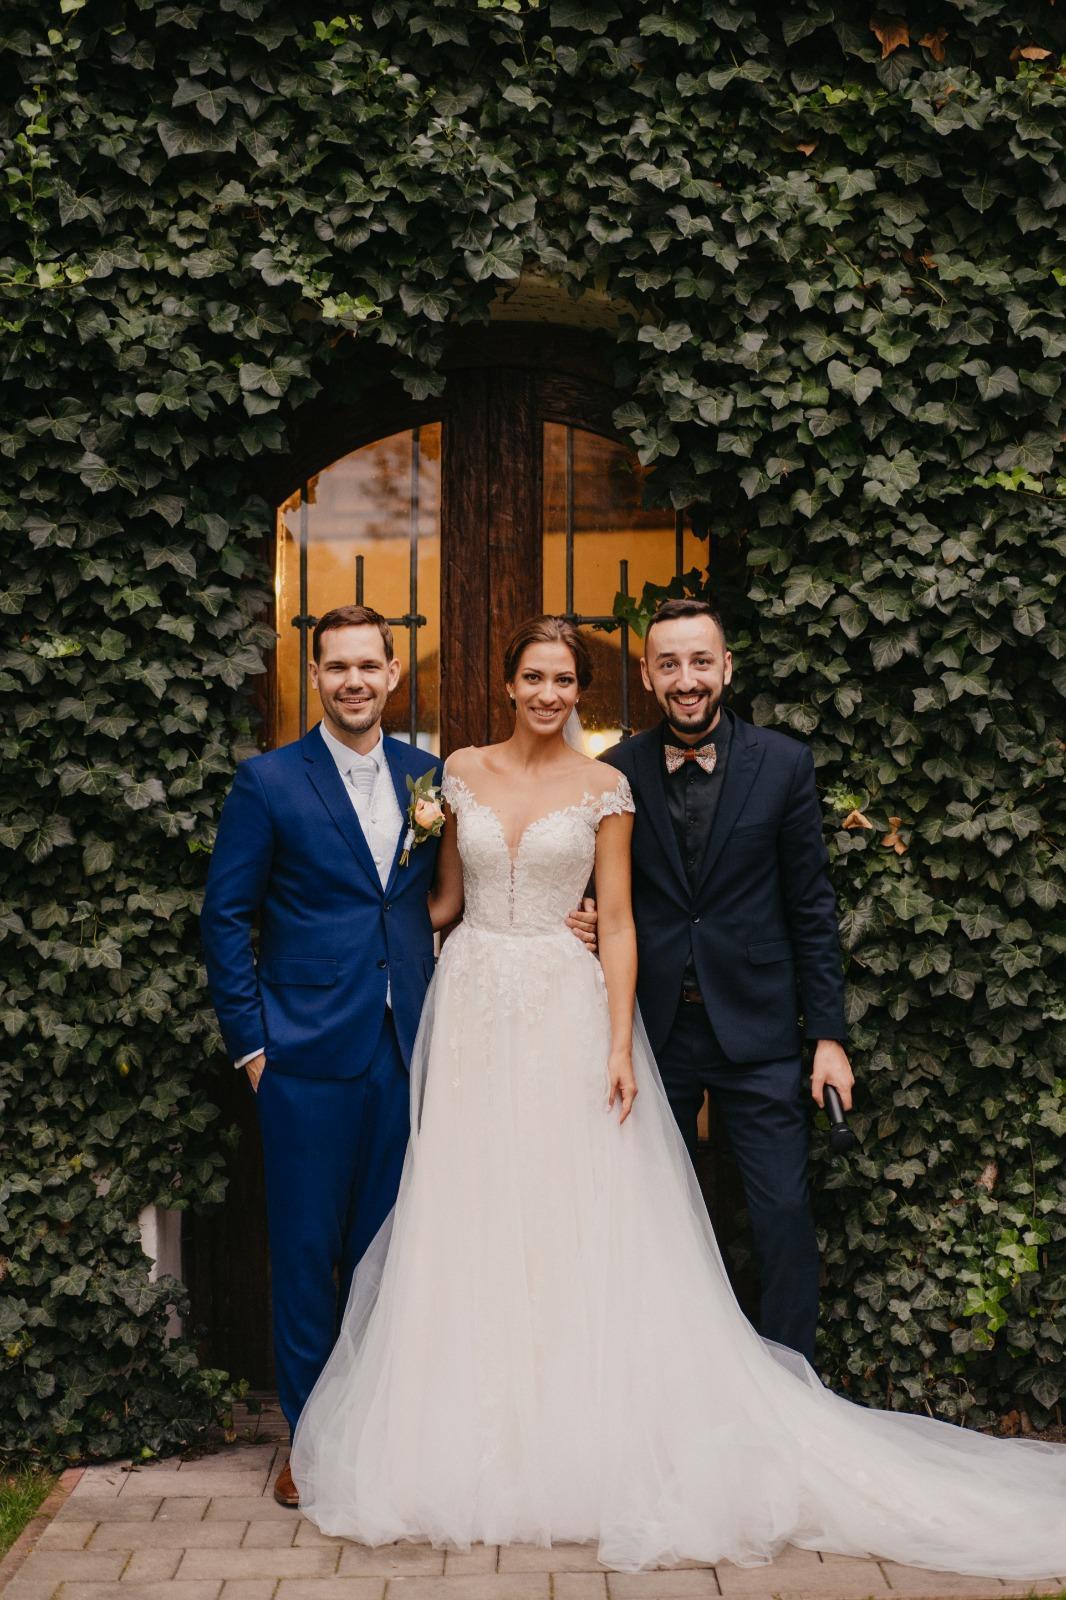 ROMČA & PEŤO, svadba Neco Estate Winery - Obrázok č. 1